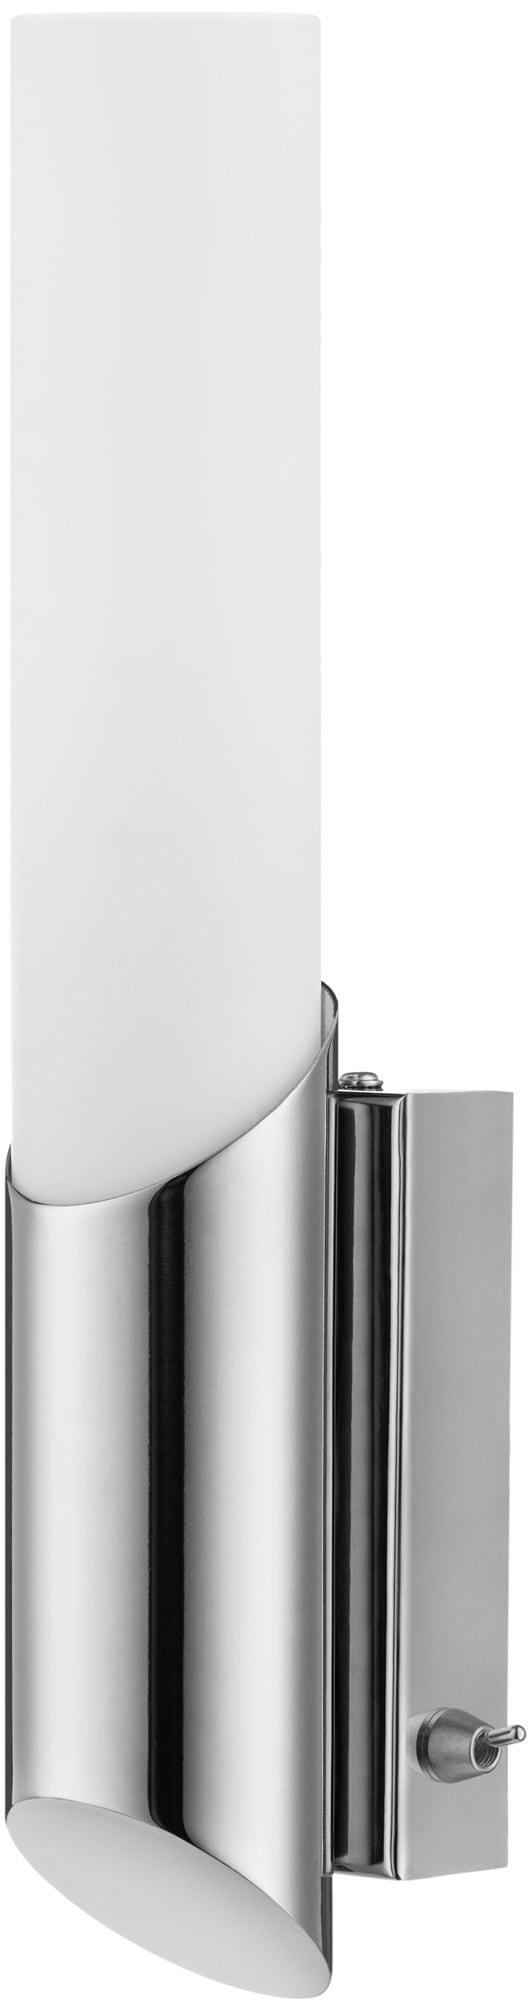 Nástěnná lampa chromovaná Aquatic chrom / bílá E14 40W